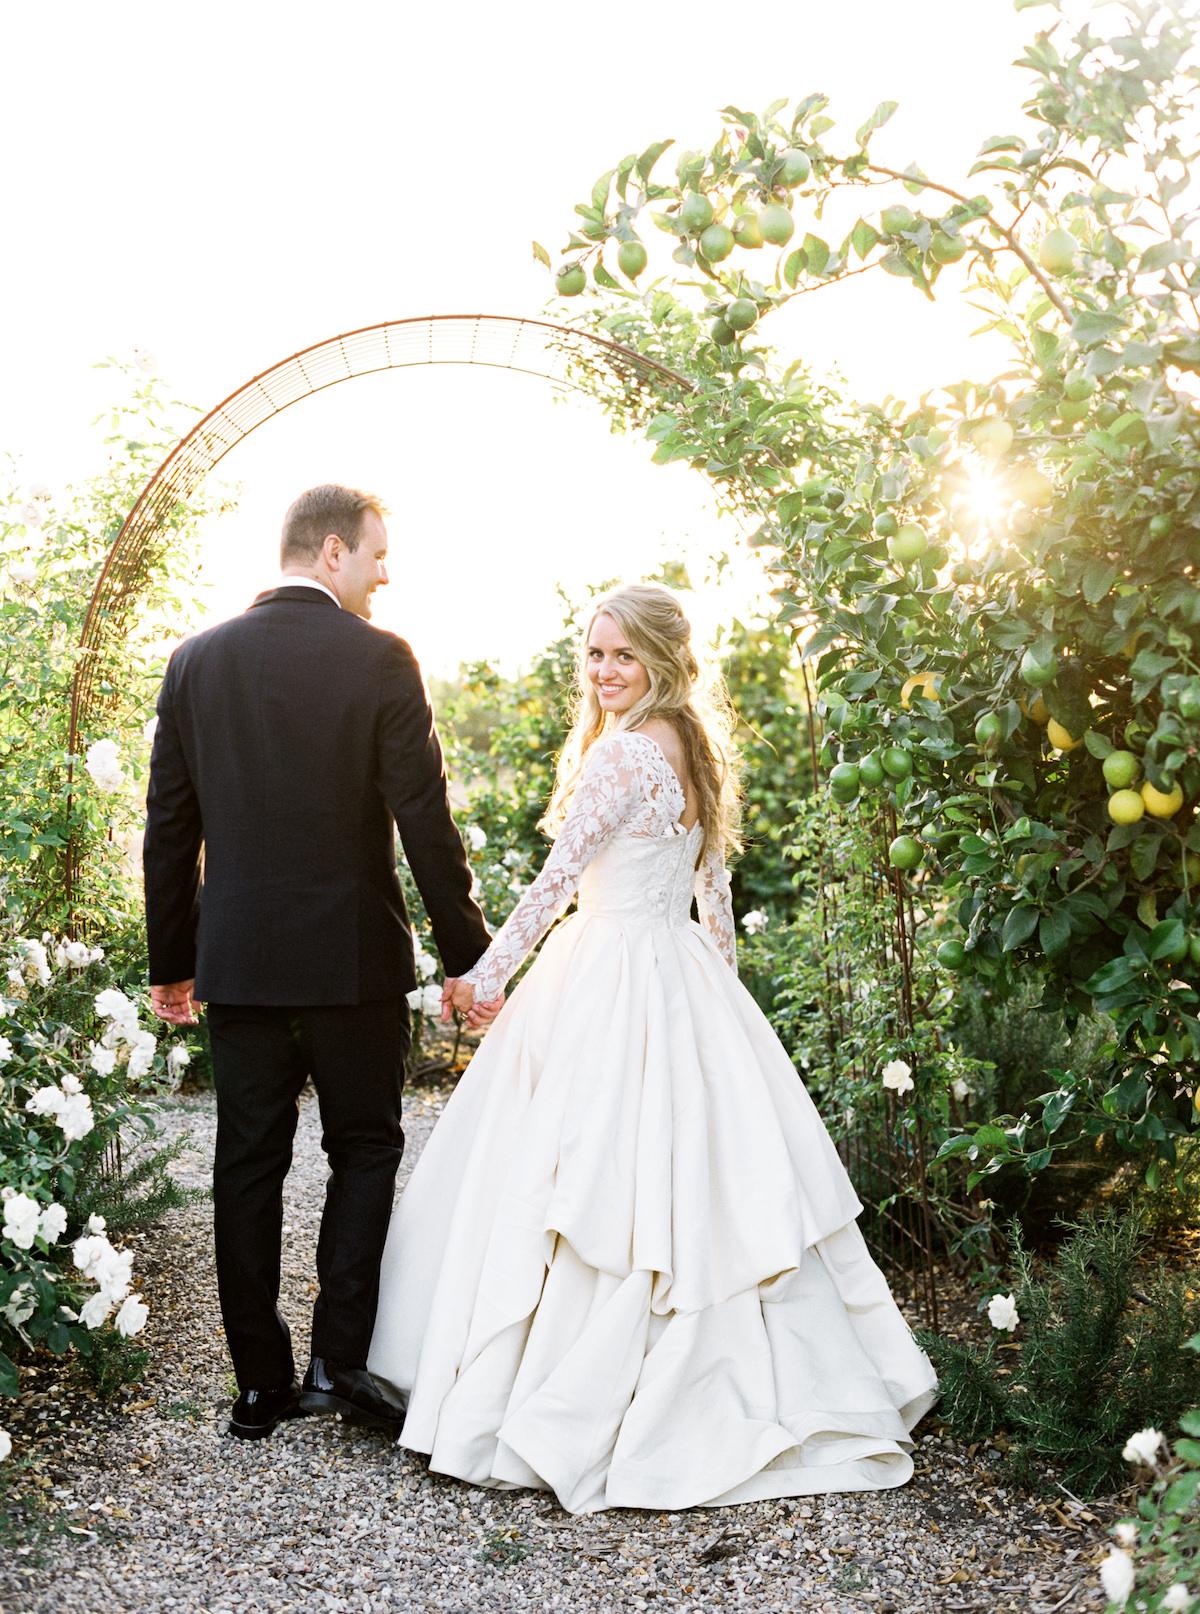 Ashley-Rae-Studio-Film-Wedding-Photography-San-Luis-Obispo-Wedding-Photographers.jpg